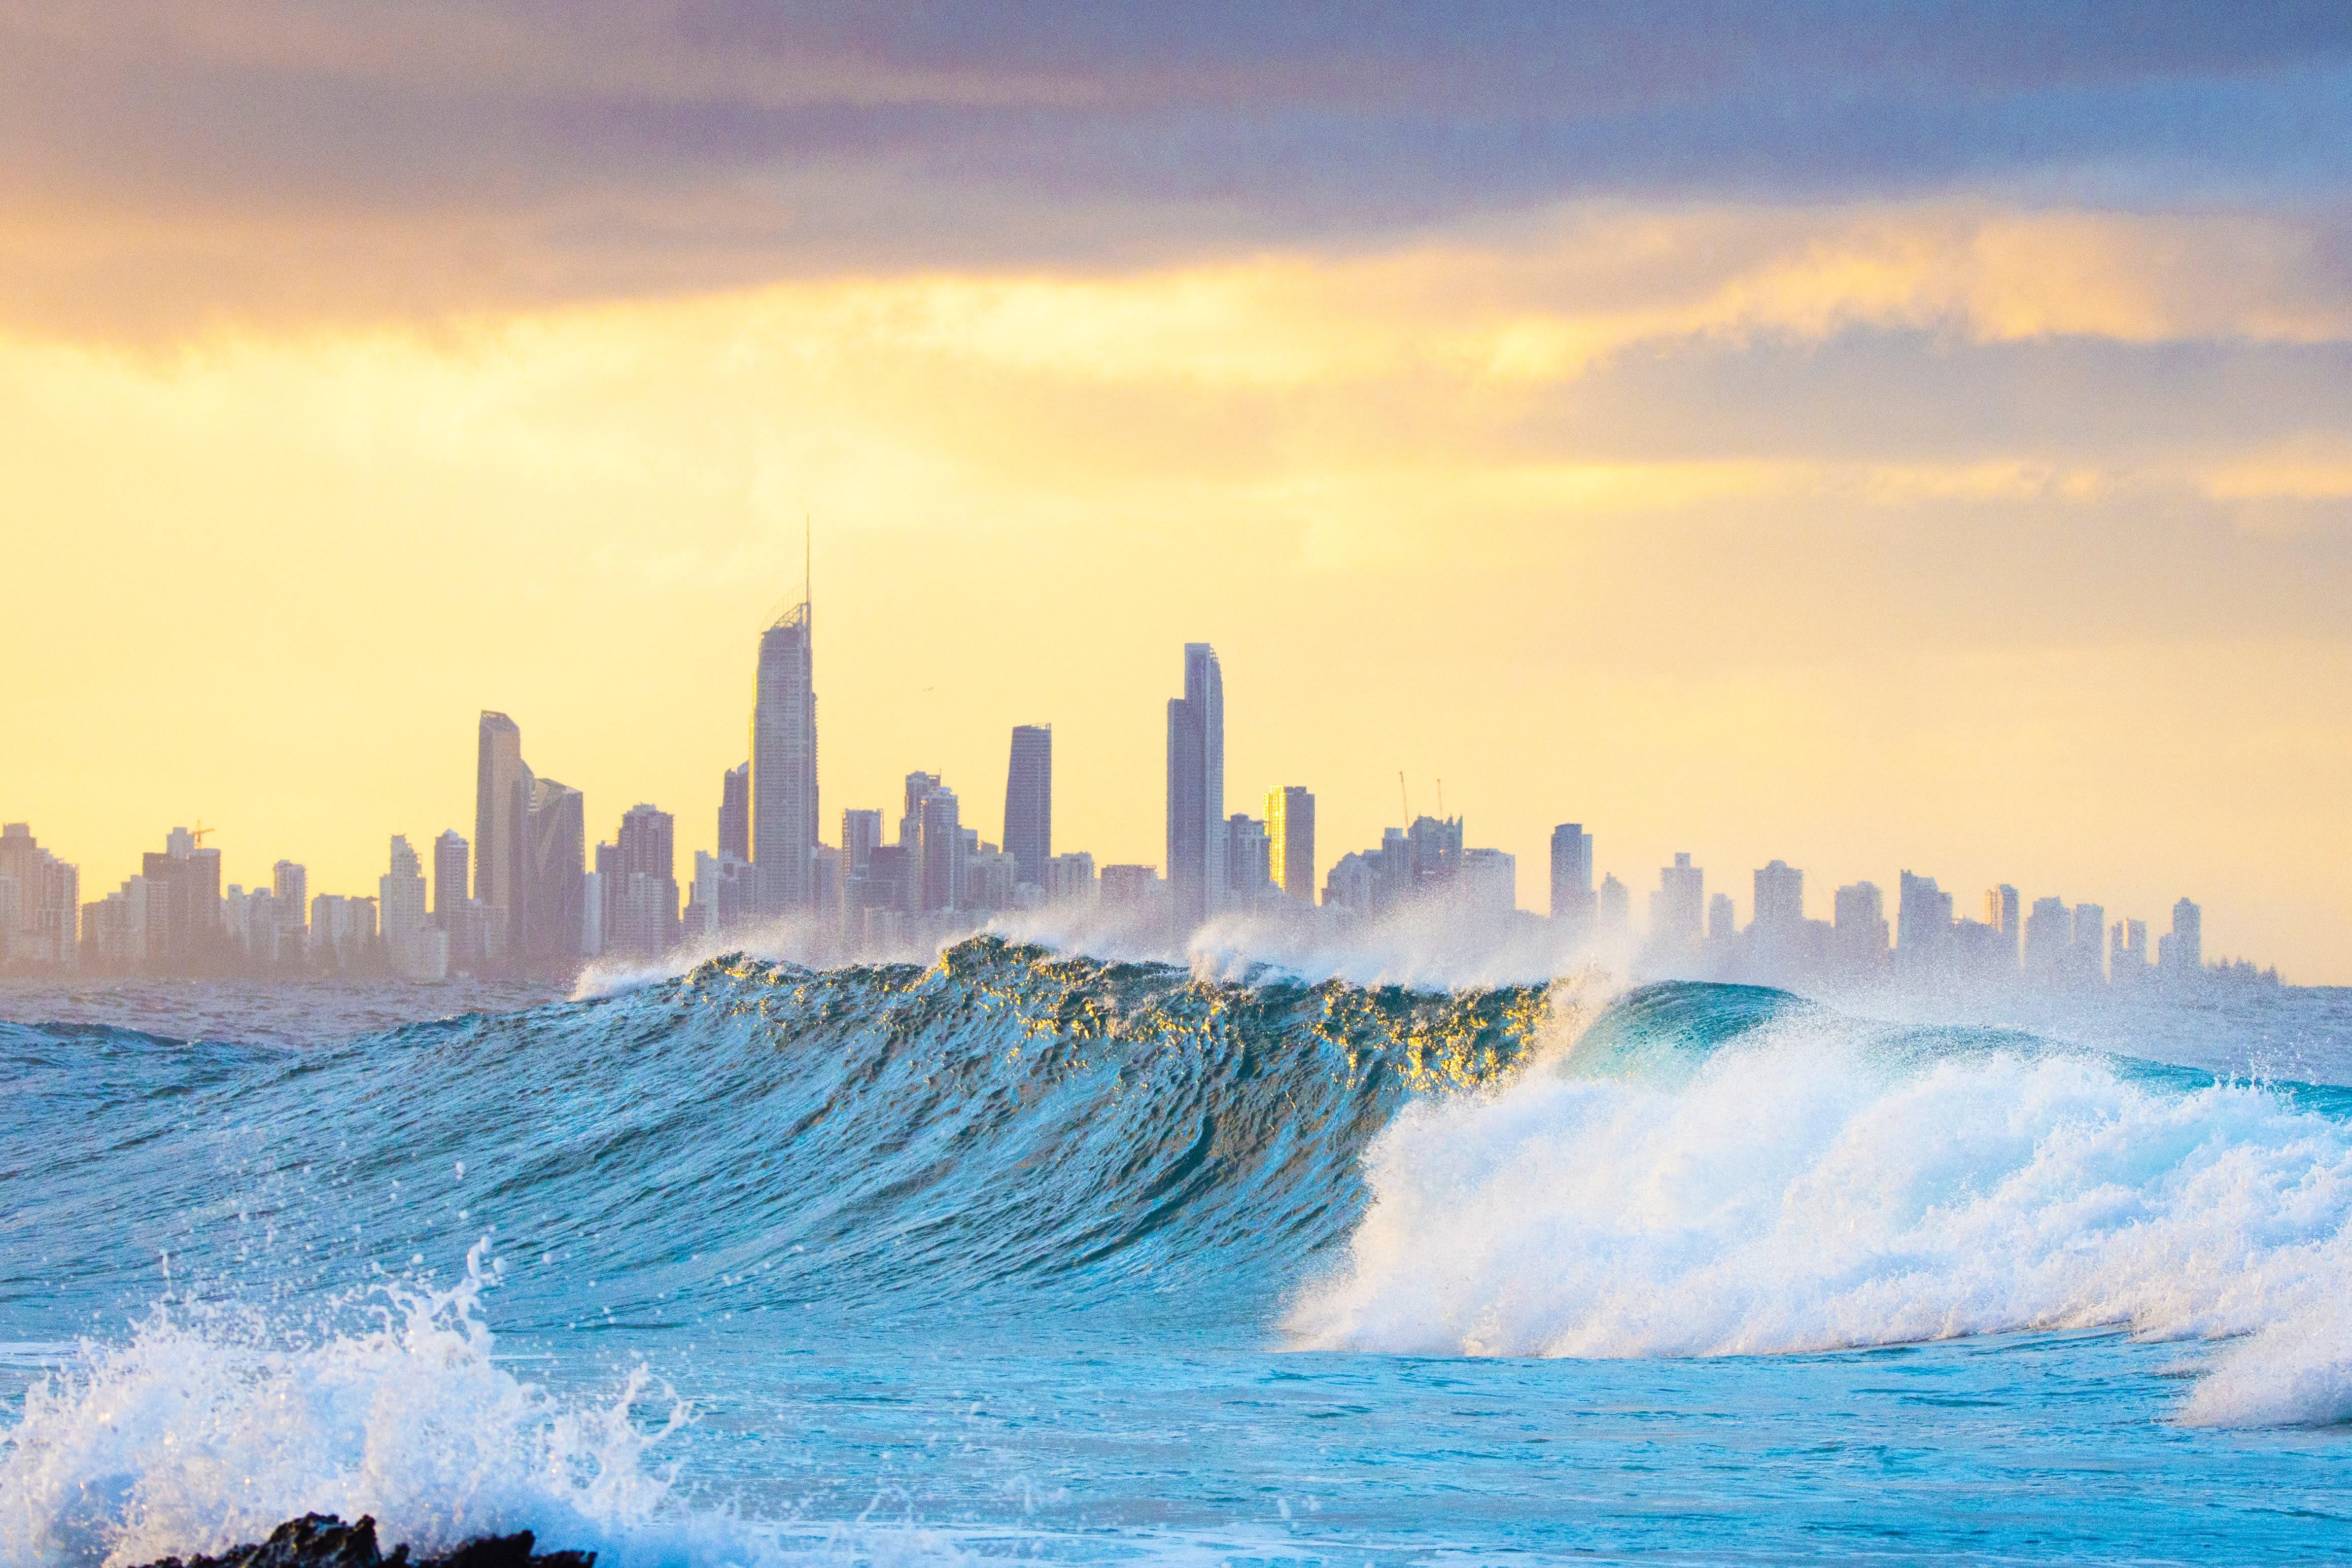 Ocean Unite_Ocean Risk and Resilience Action Alliance_ORRAA